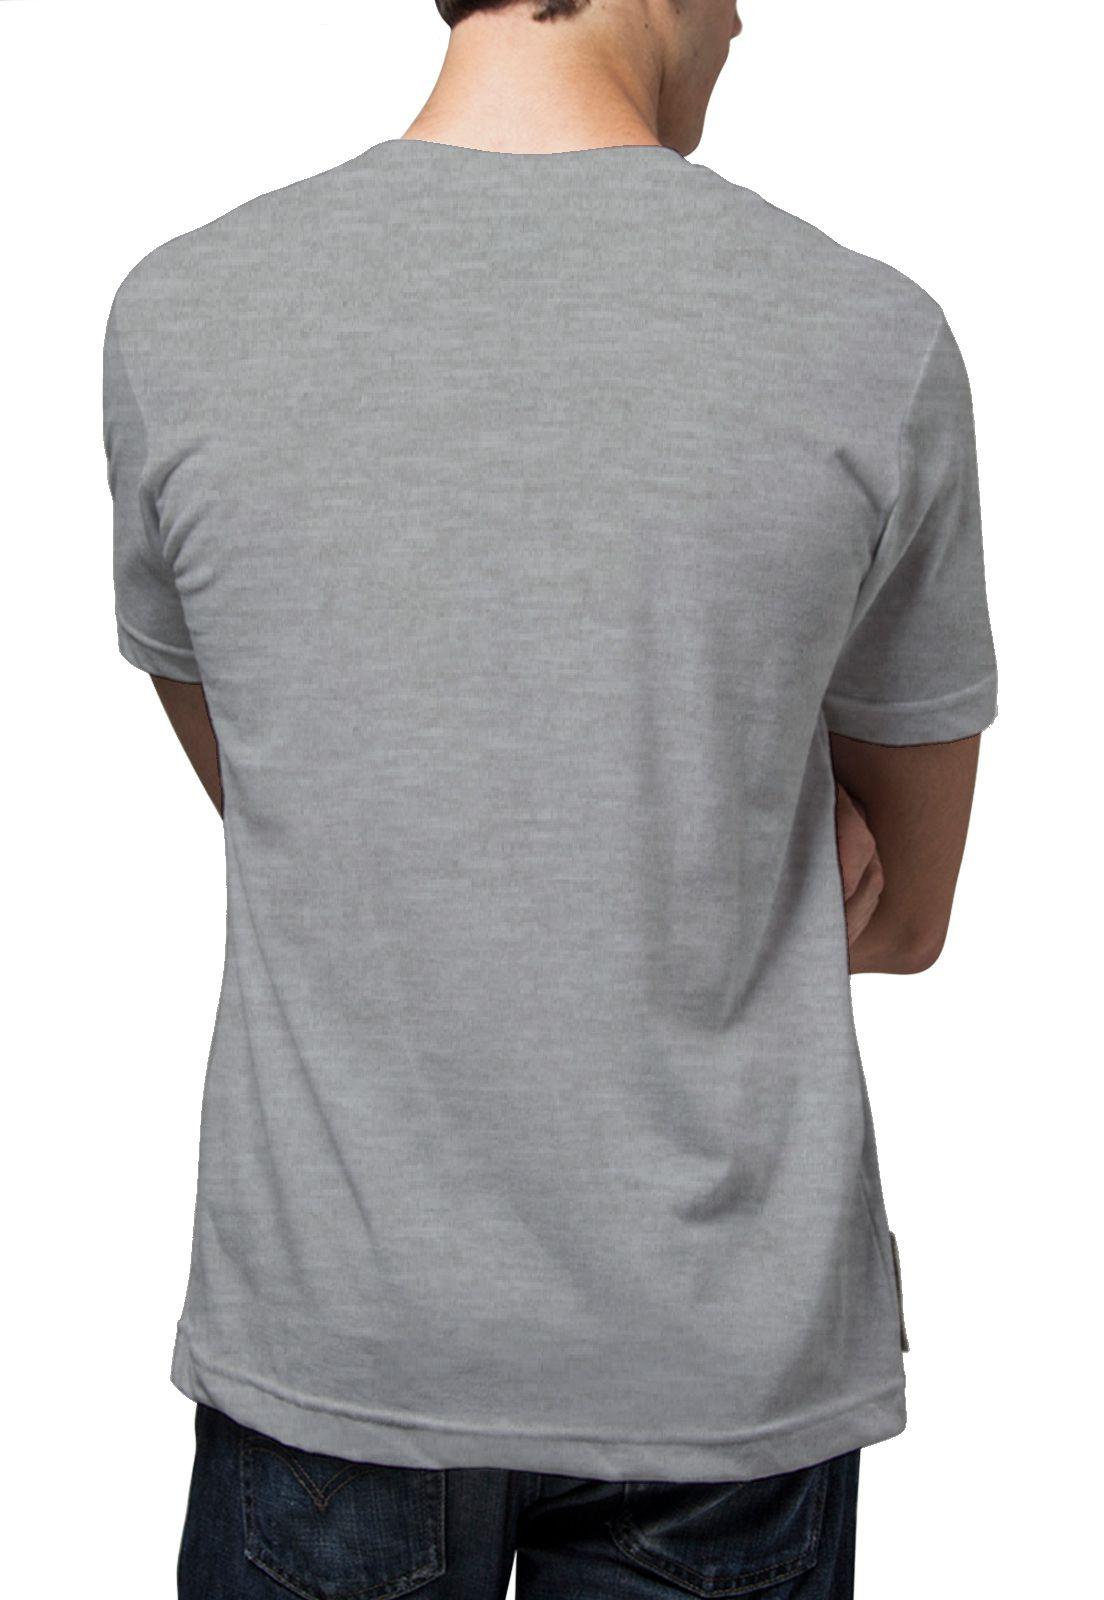 Camiseta Amazônia Jubarte - Cinza